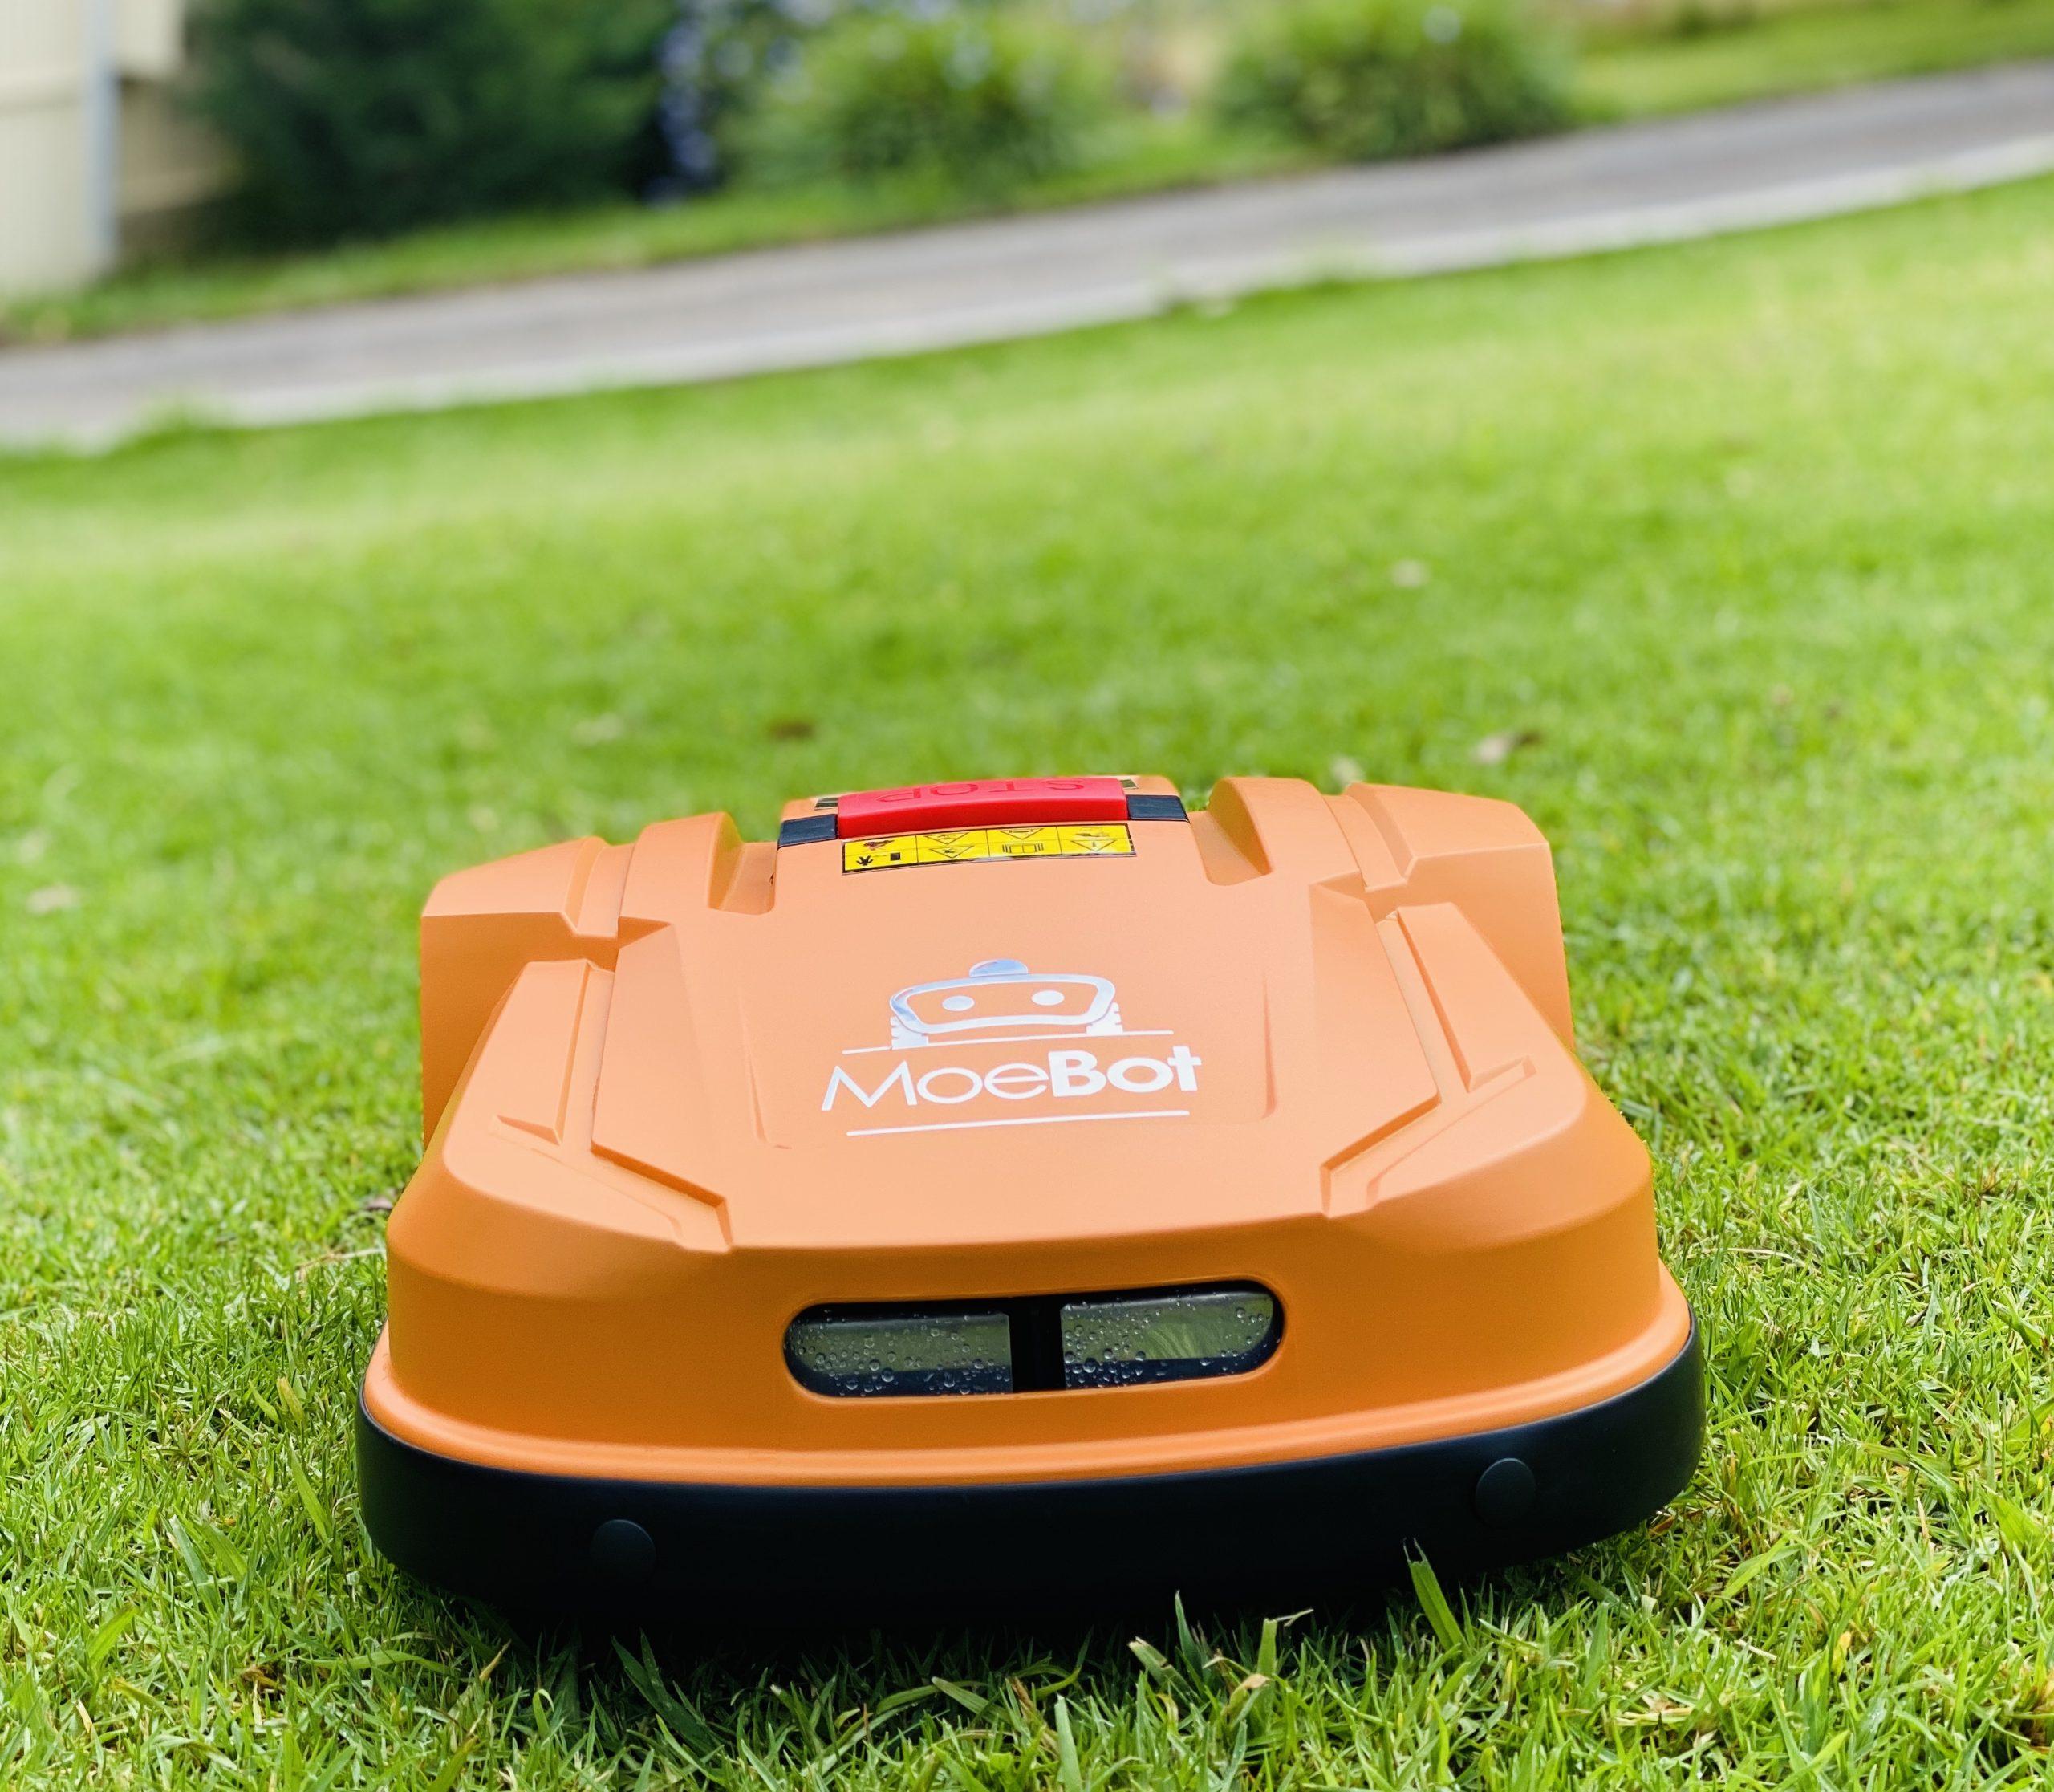 MoeBot Size - Robot Lawn Mower